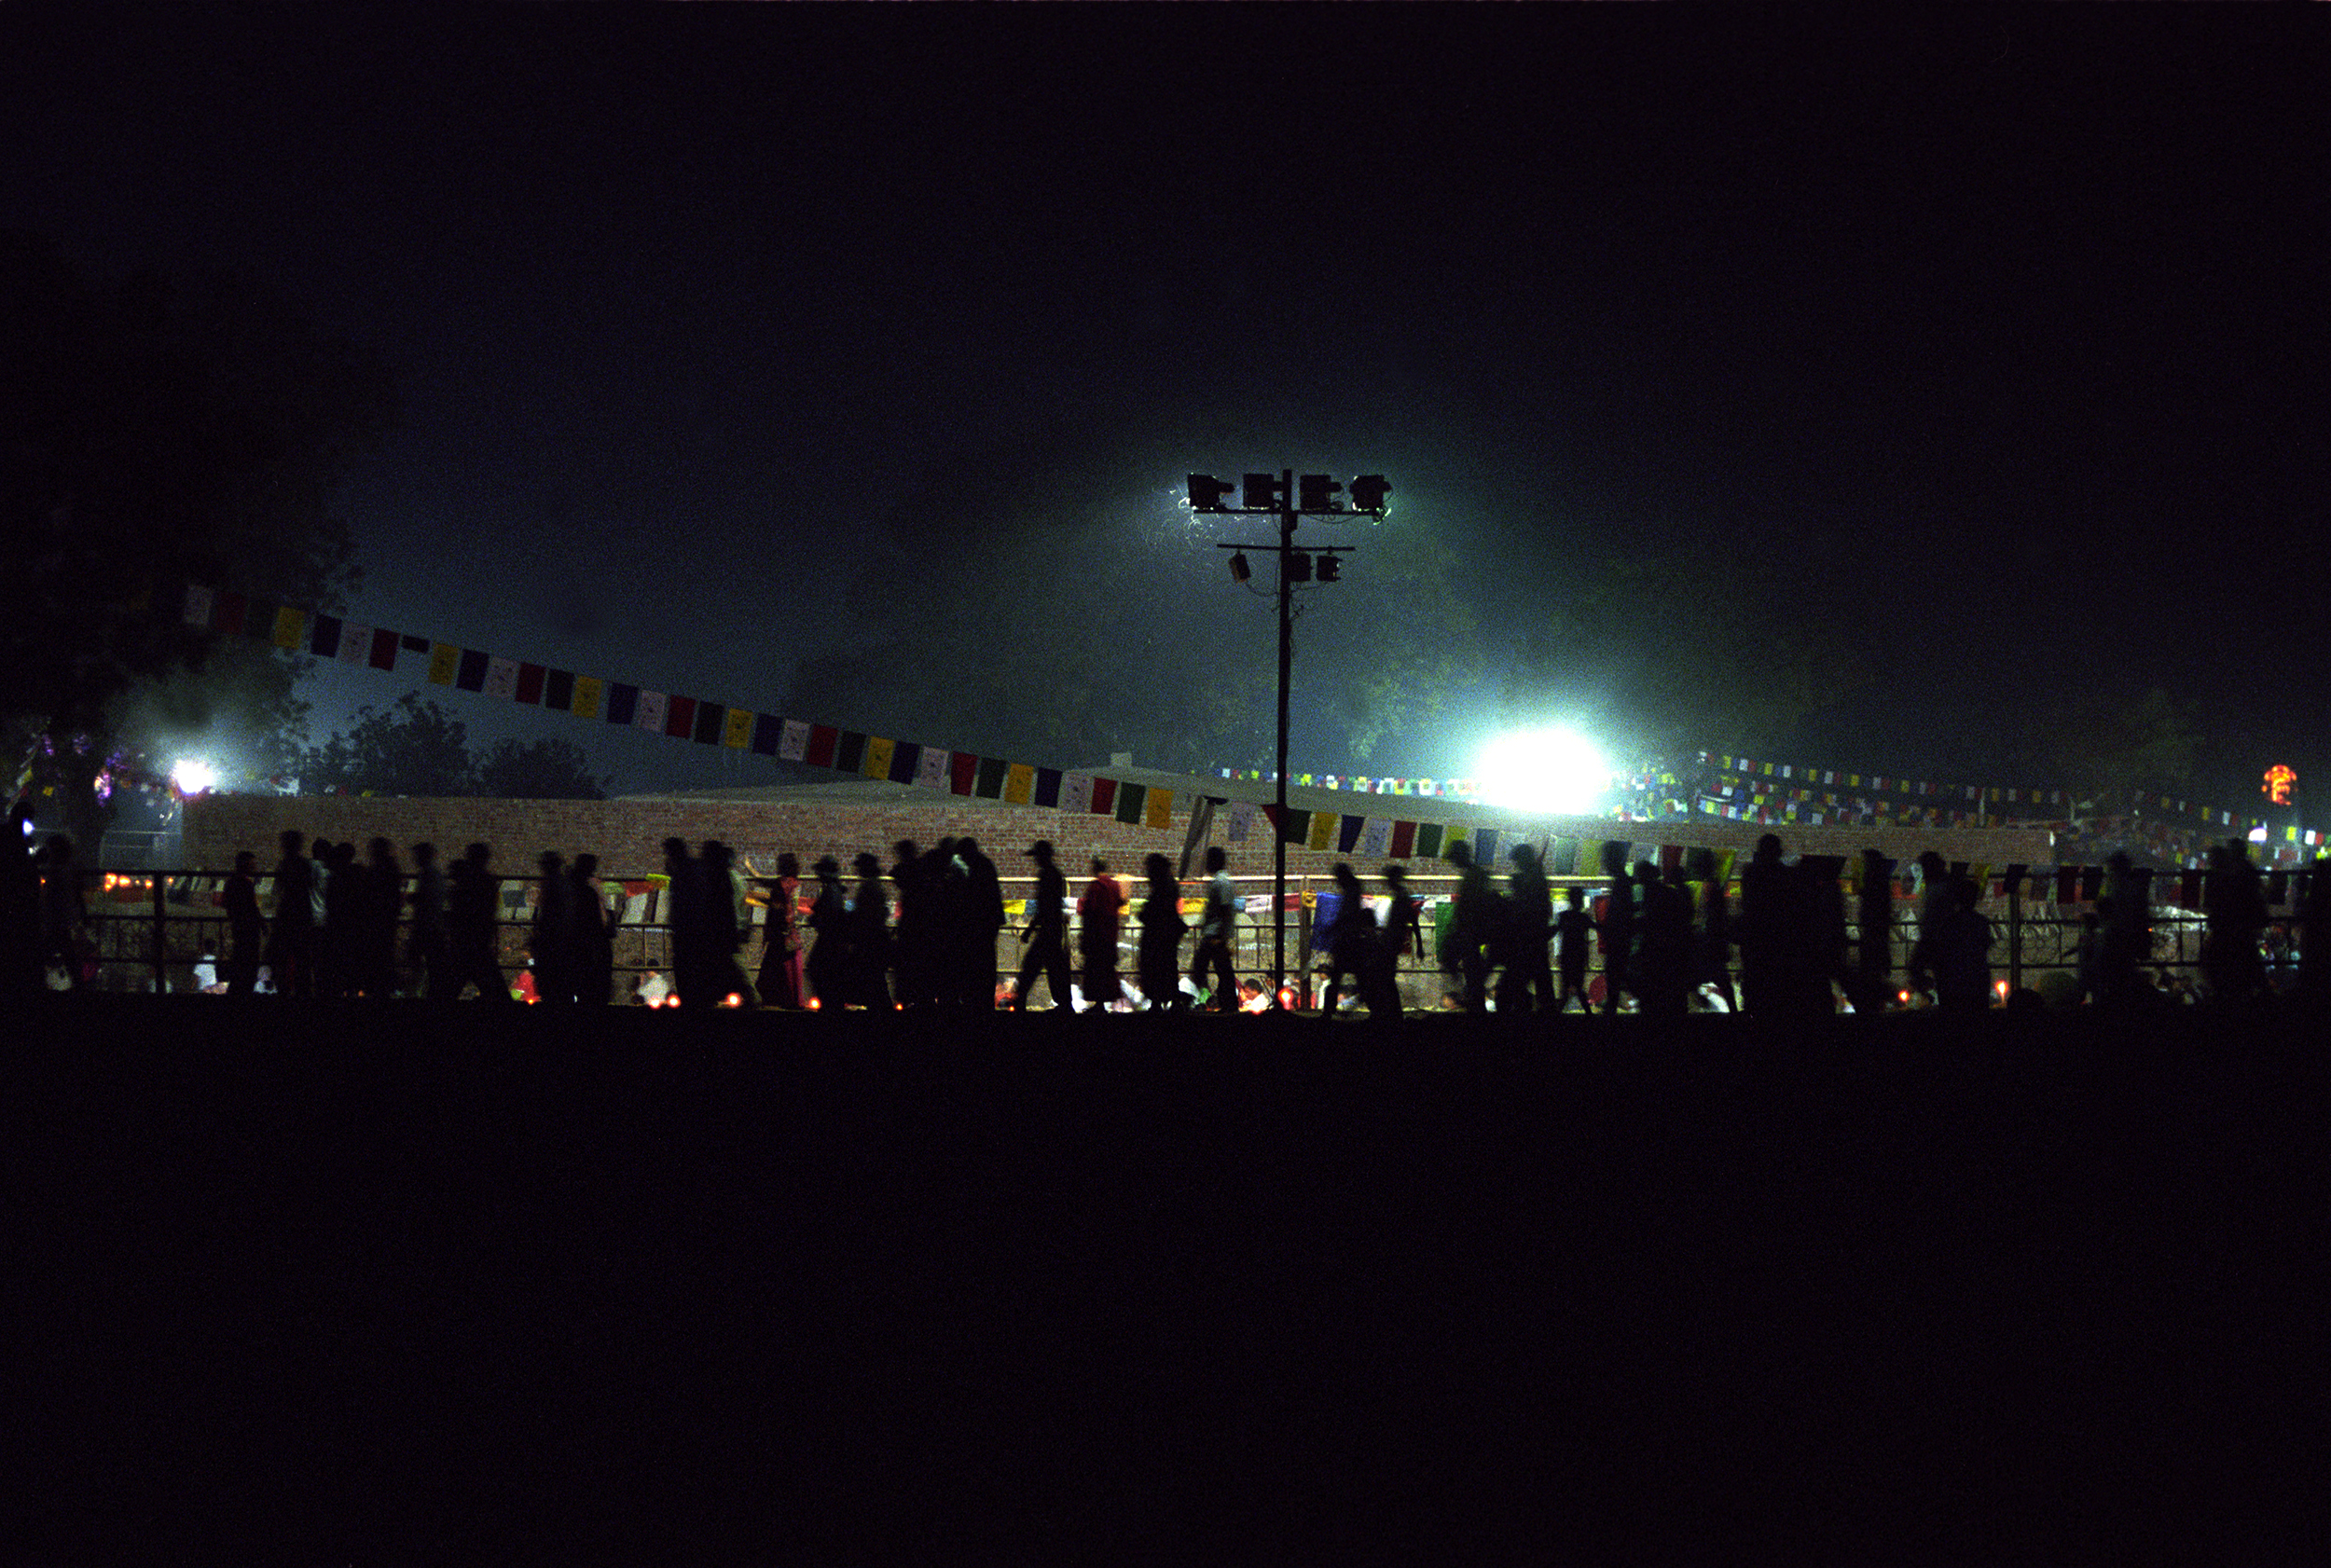 Web_amar_night stupa017.jpg